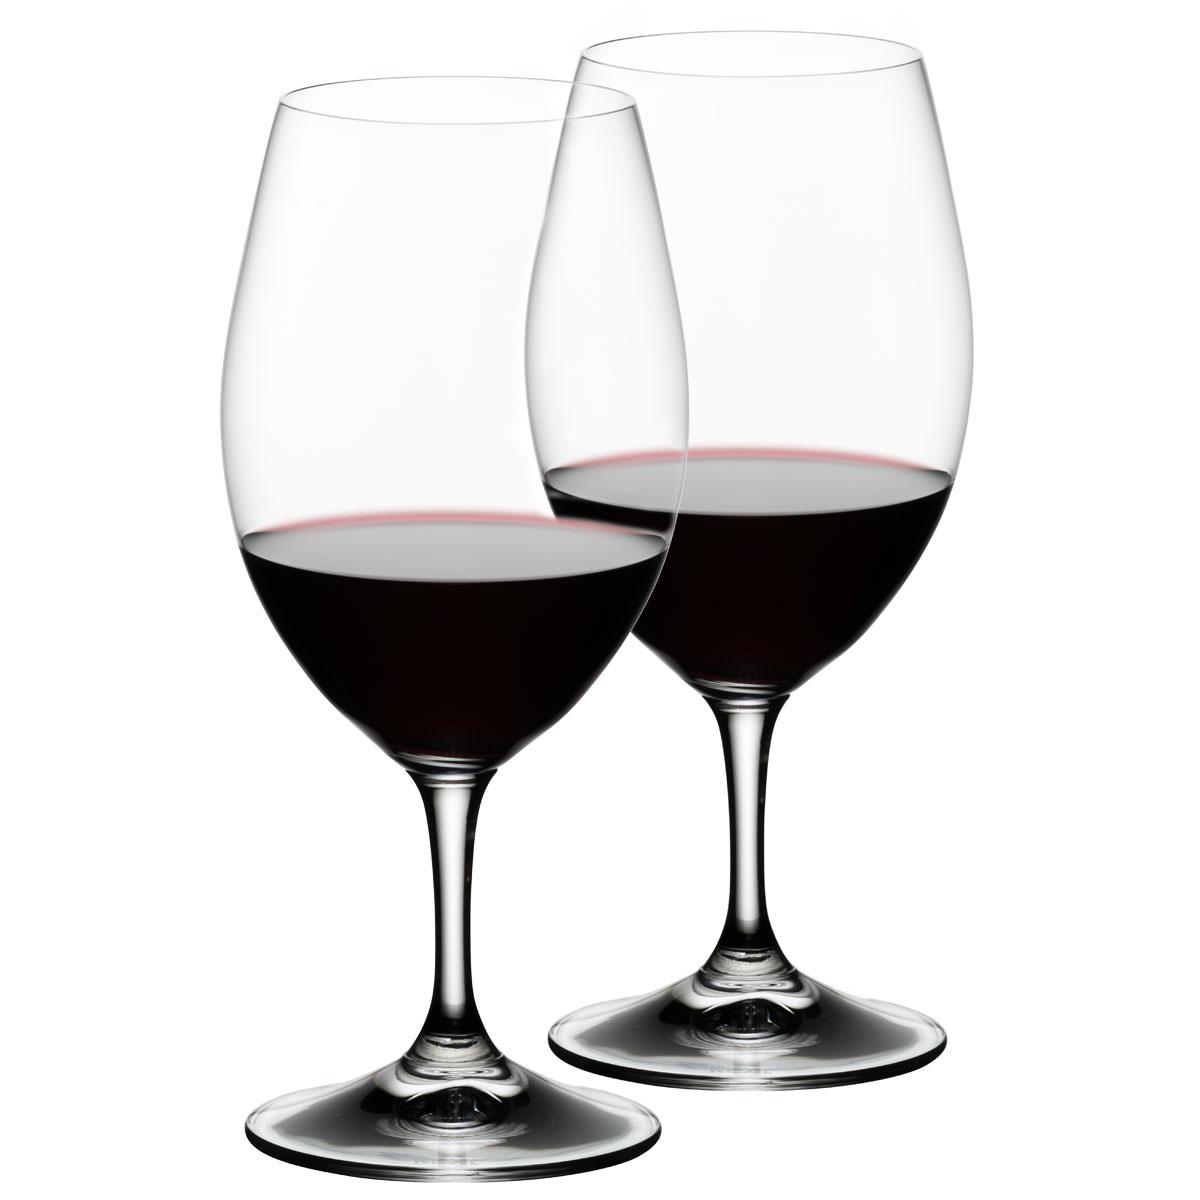 Riedel Ouverture Magnum Wine Glasses, Pair